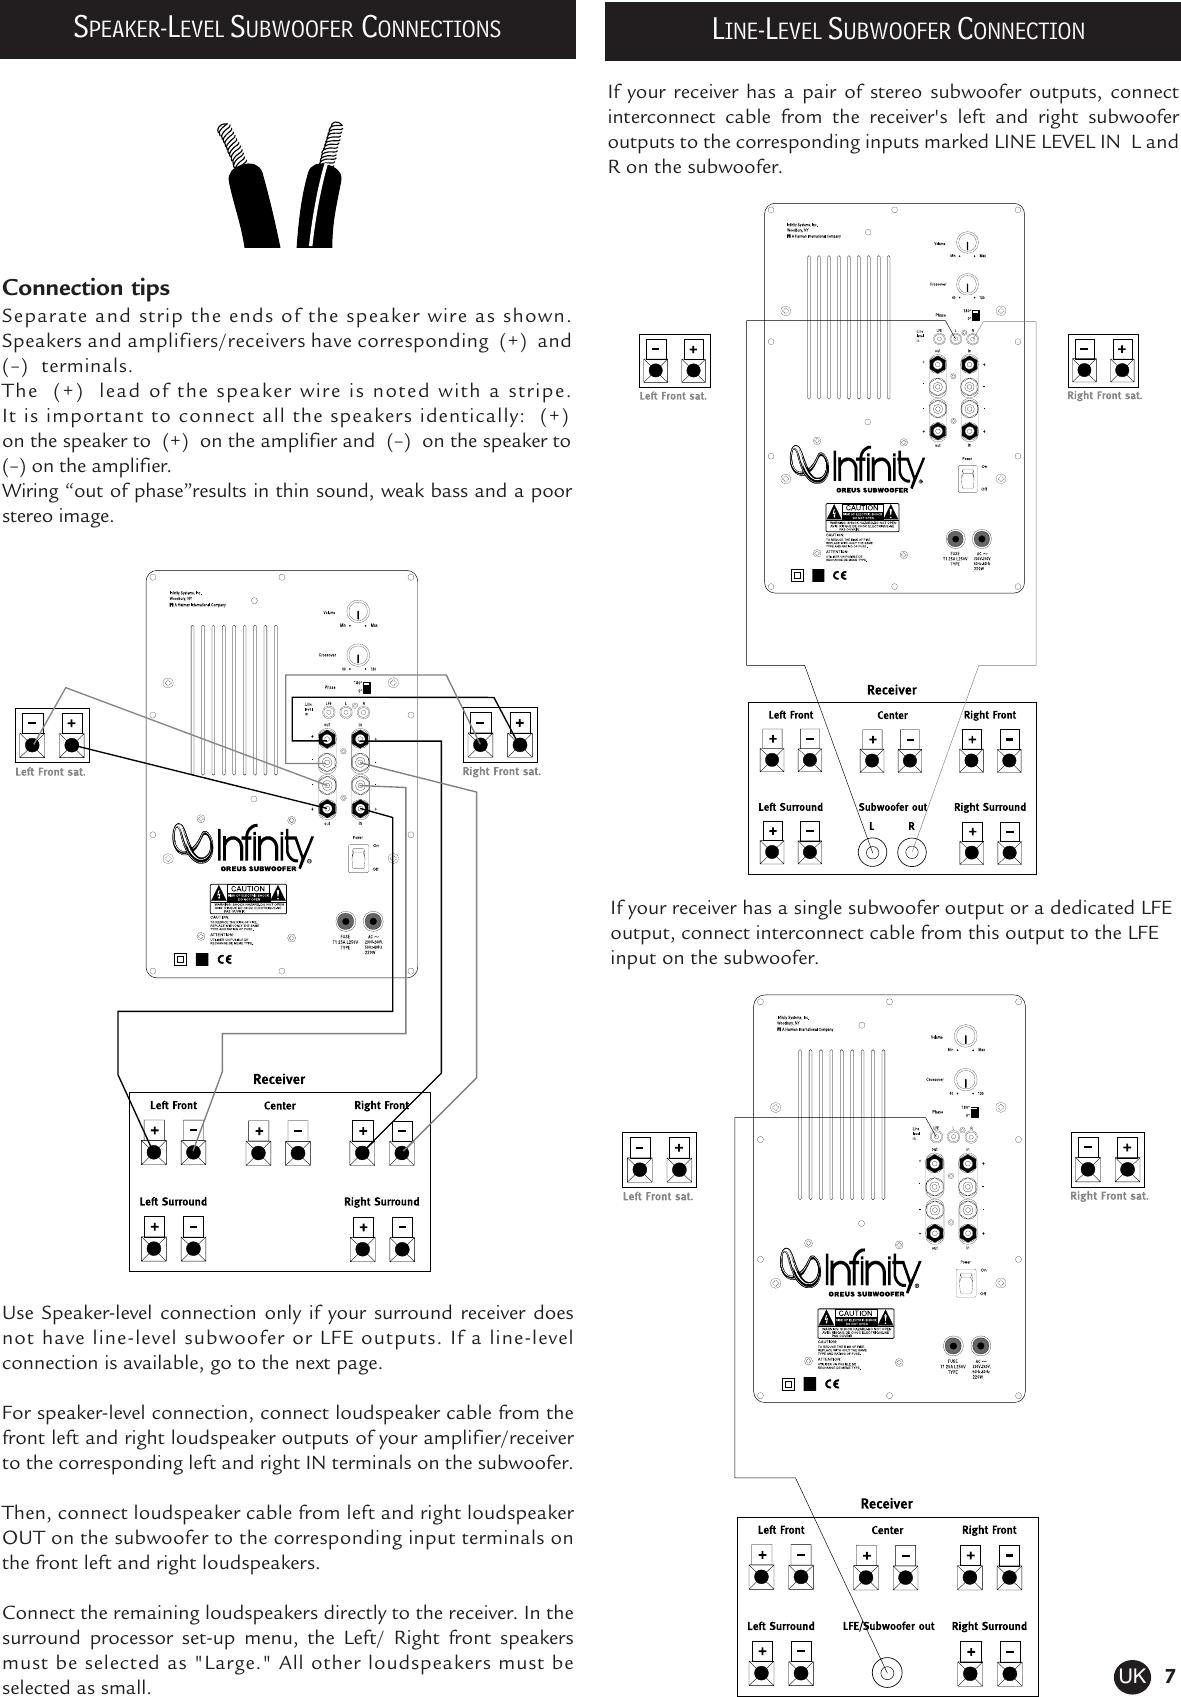 Subwoofer Amplifier Circuit Diagram Hcs Ps 10 Schematic Gain Control Amplifiercircuit Infinity Oreus Users Manual Uk Boston Mcs 95 Page 7 Of